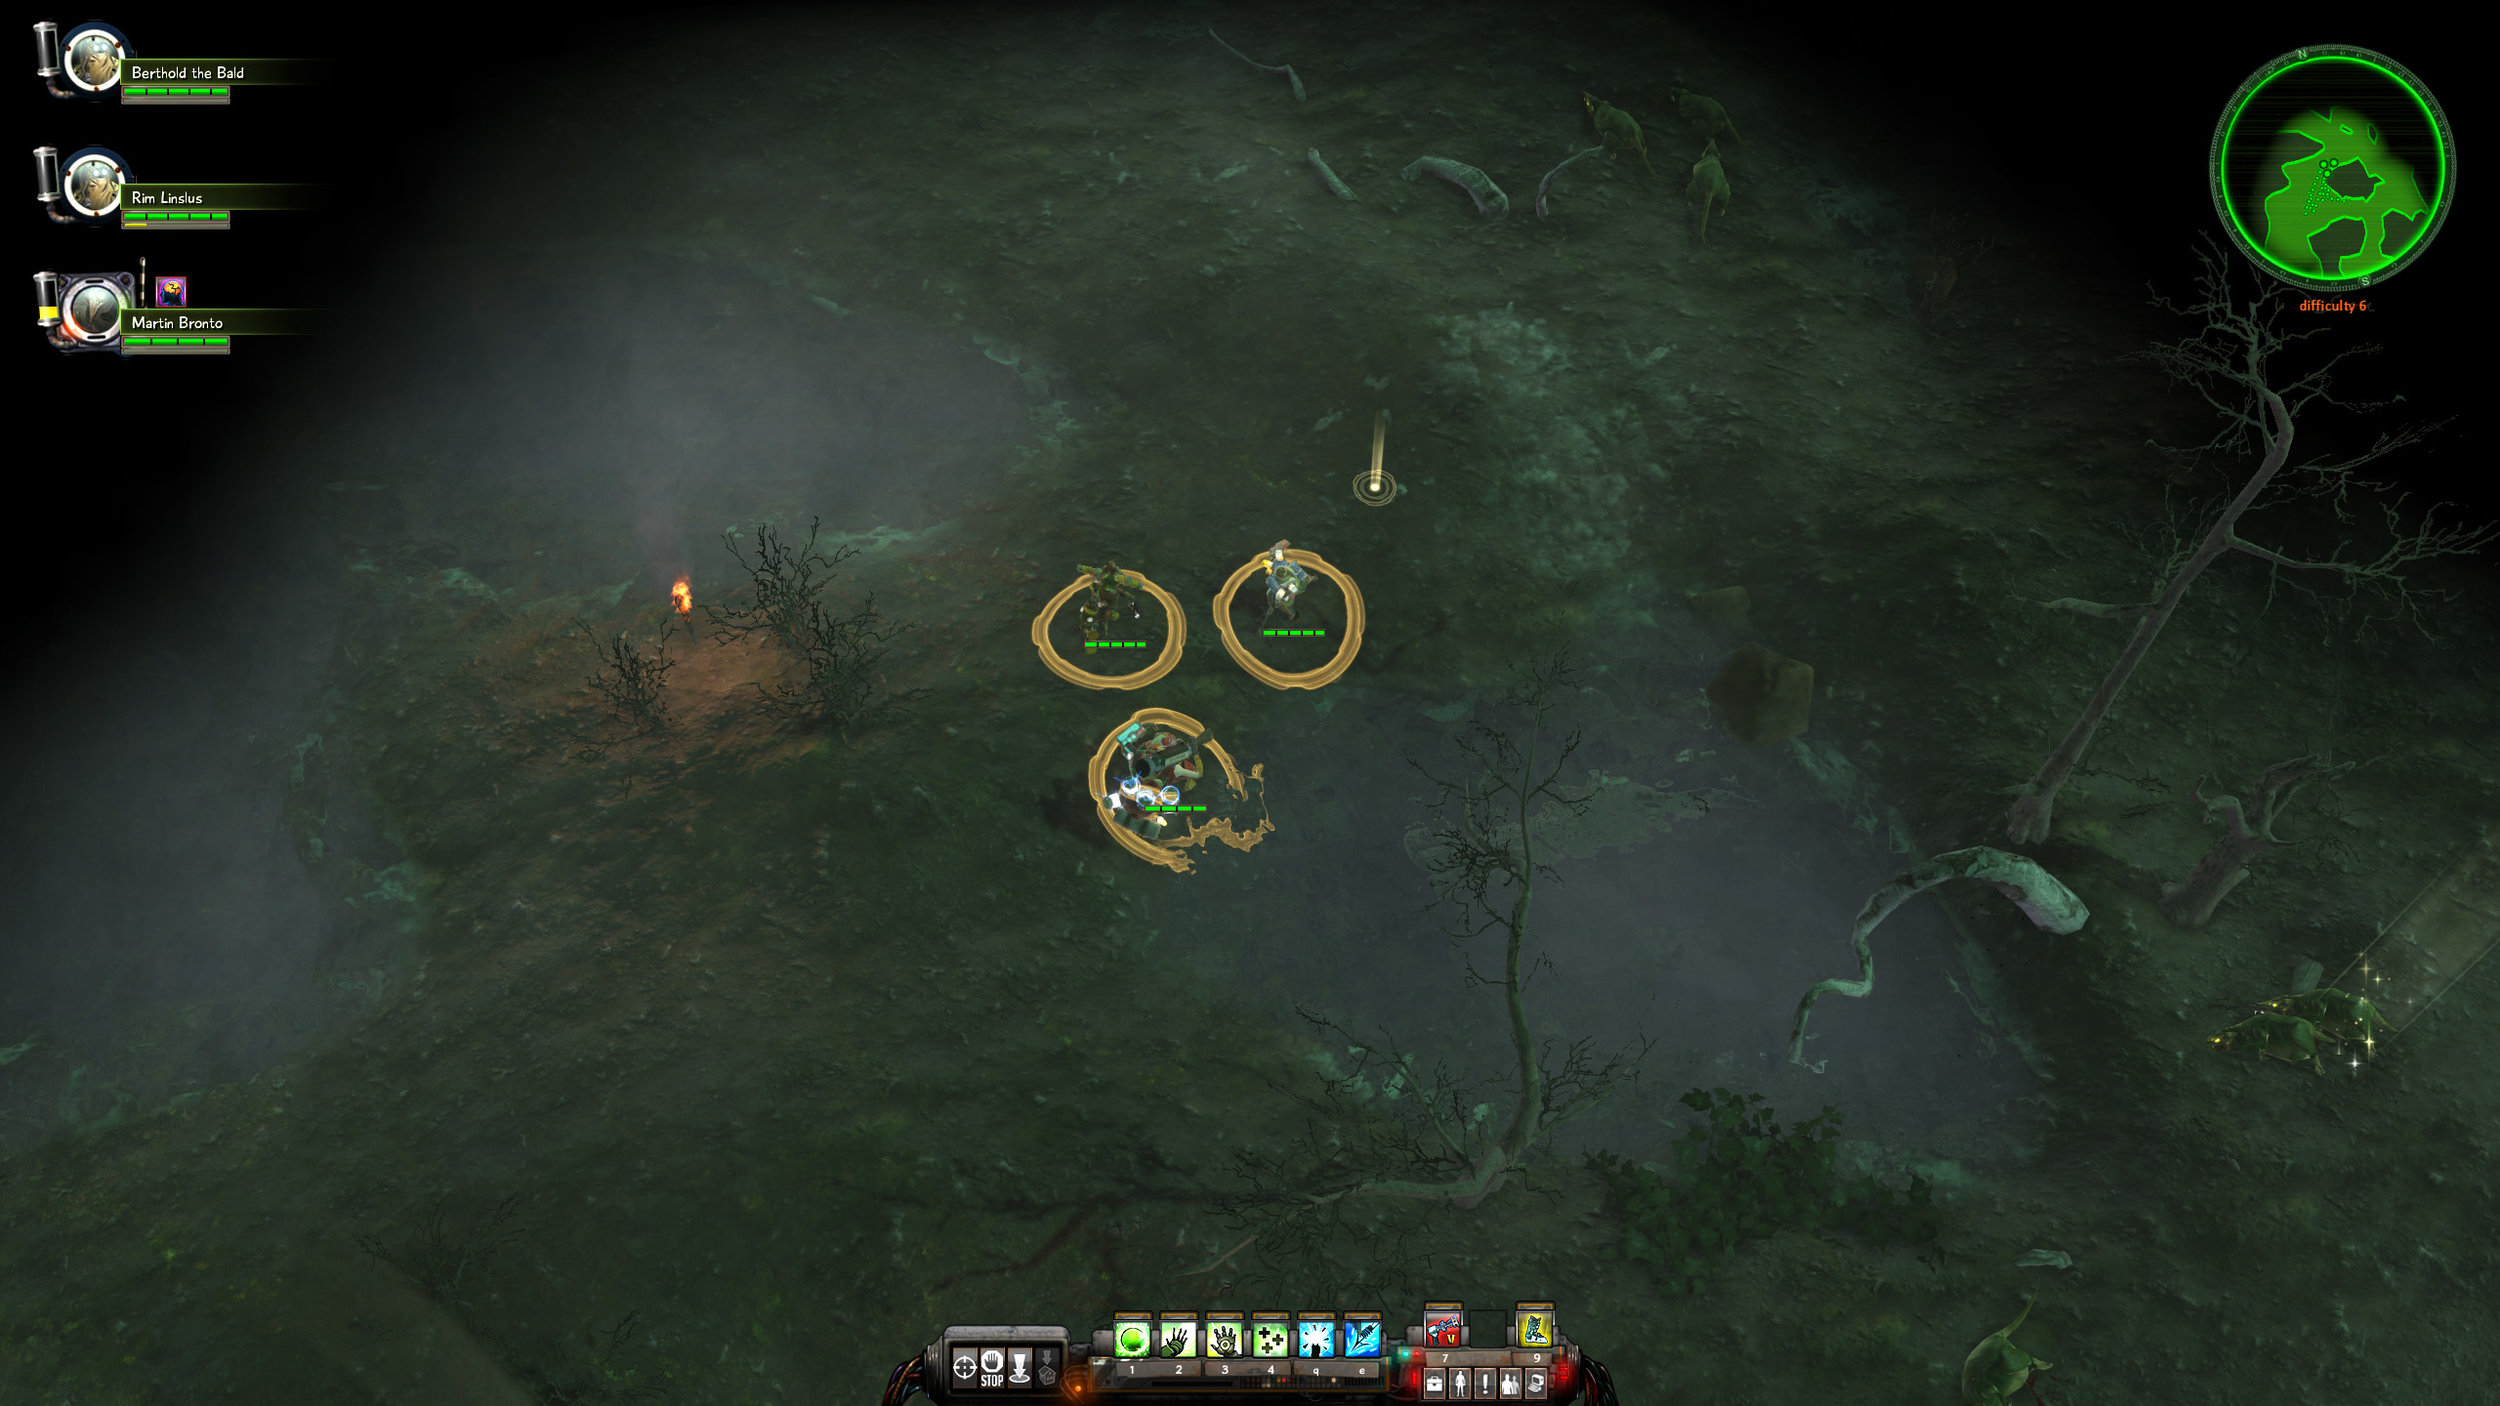 Krater Shadows over Solside Screenshot 13.jpg